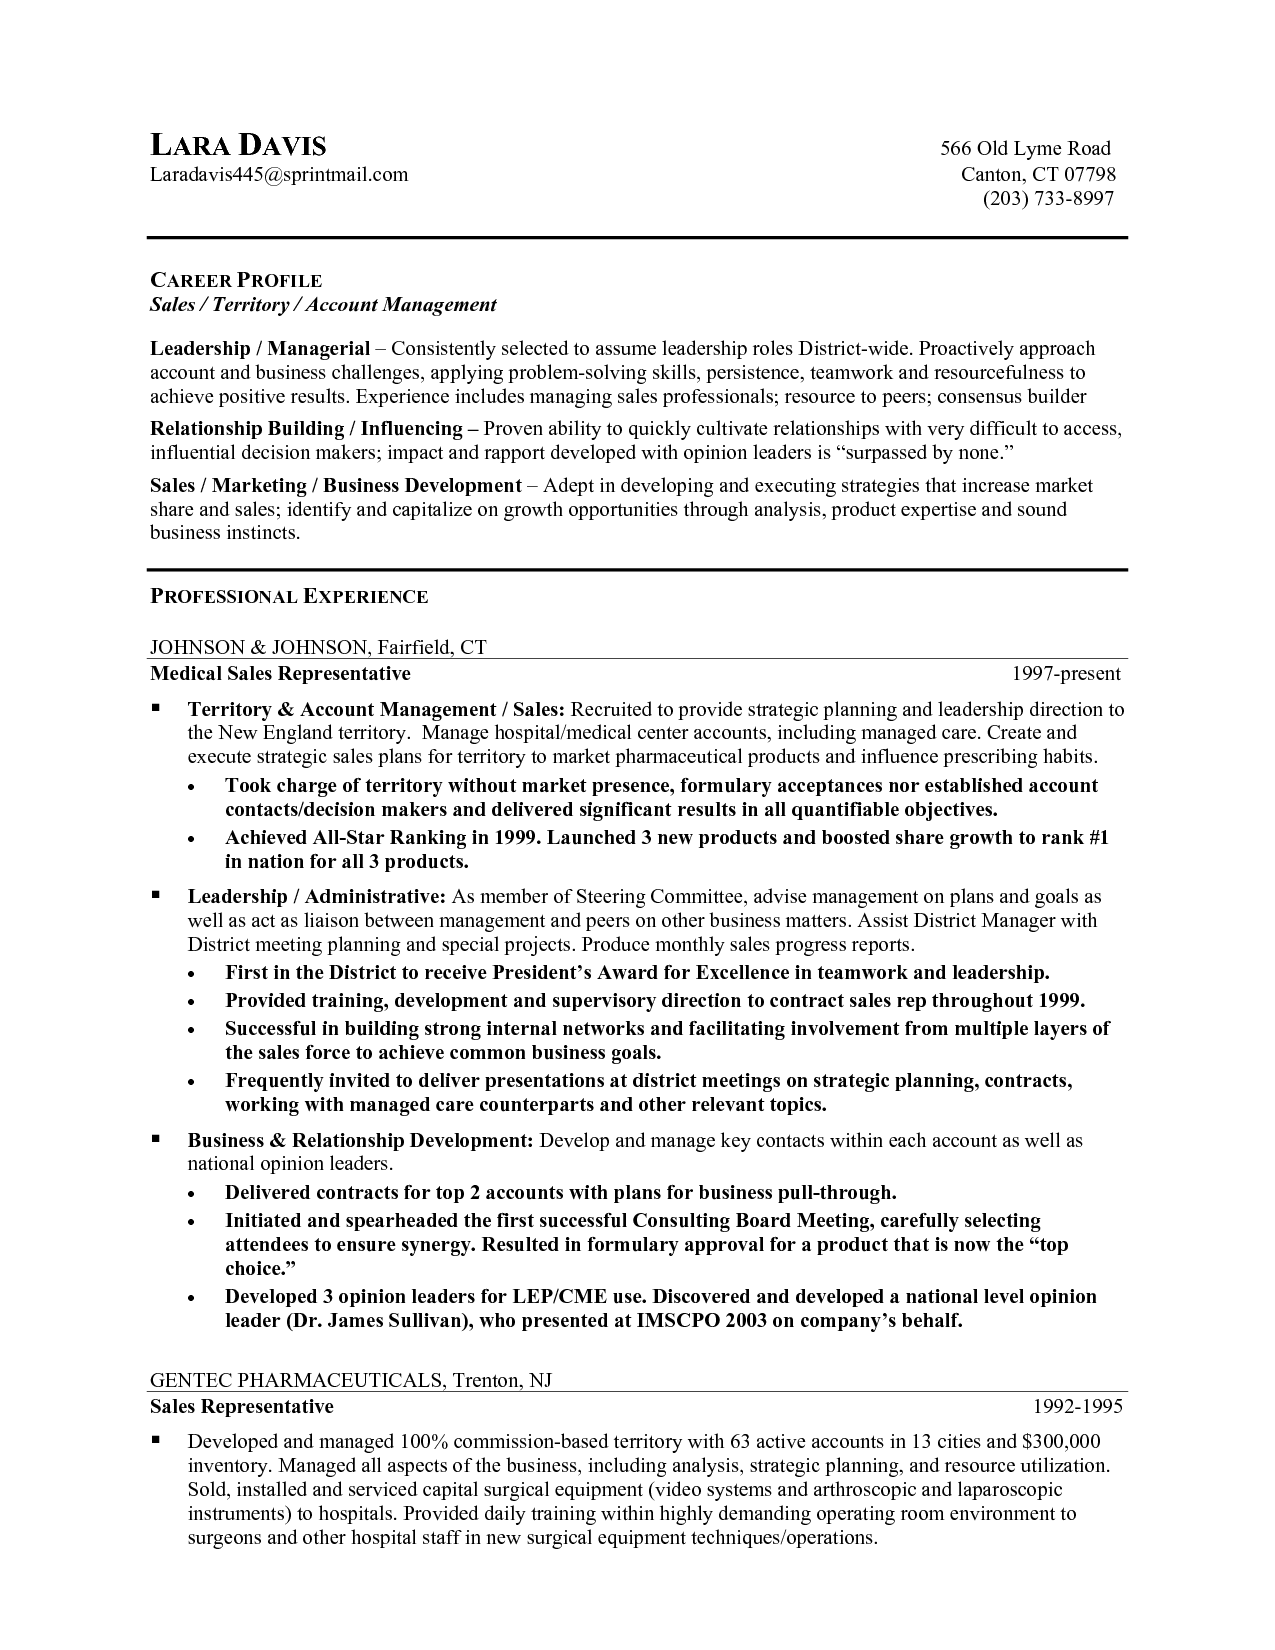 objective statement resume reddit